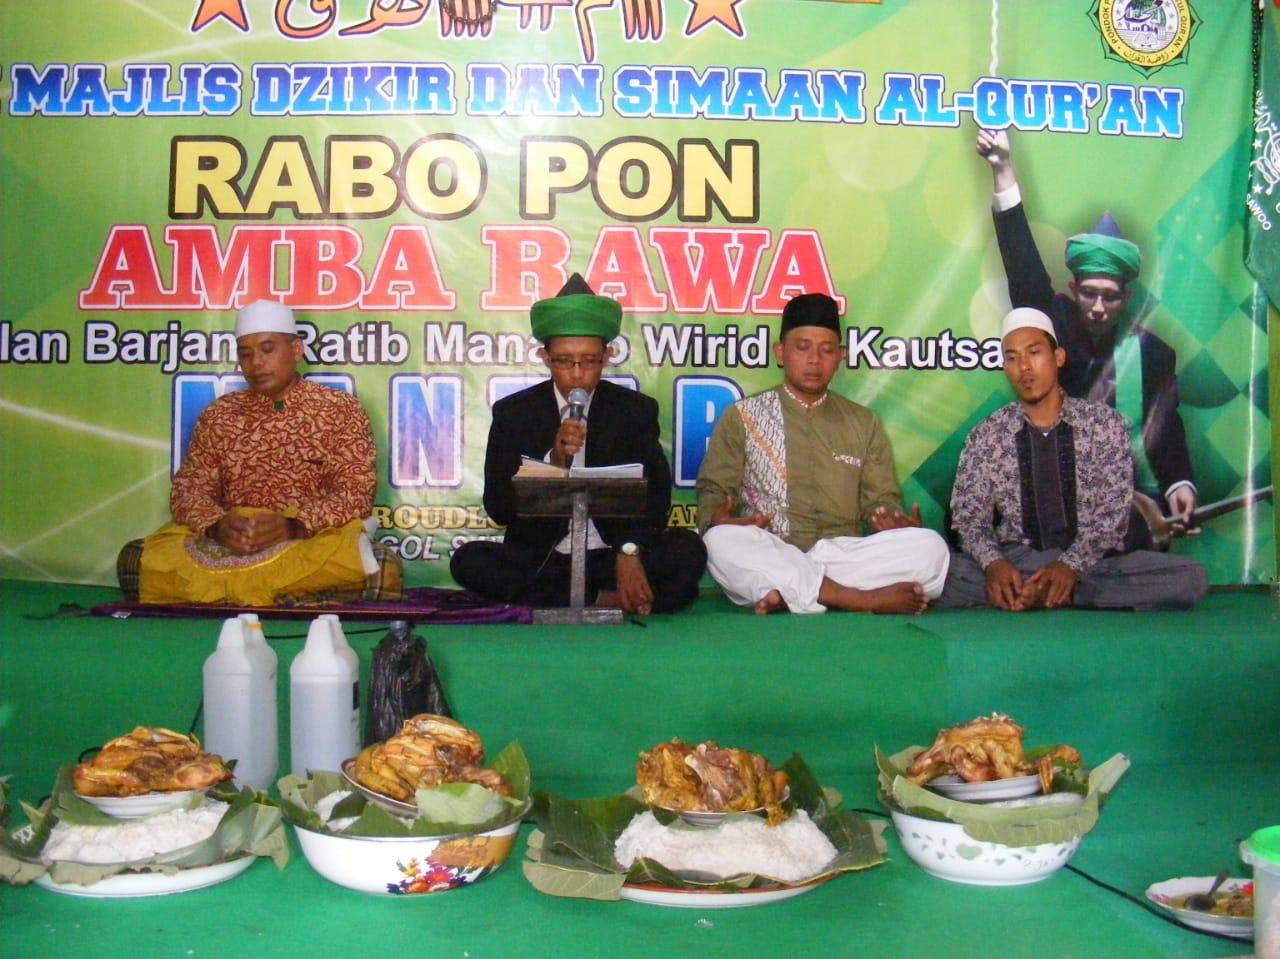 Kyai Agus Riadi Al-Hafidz pengasuh Amba Rawa Ponpes Tahfidz Alquran Raudlatul Quran Grogol, Sawoo saat memimpin doa khatmil quran